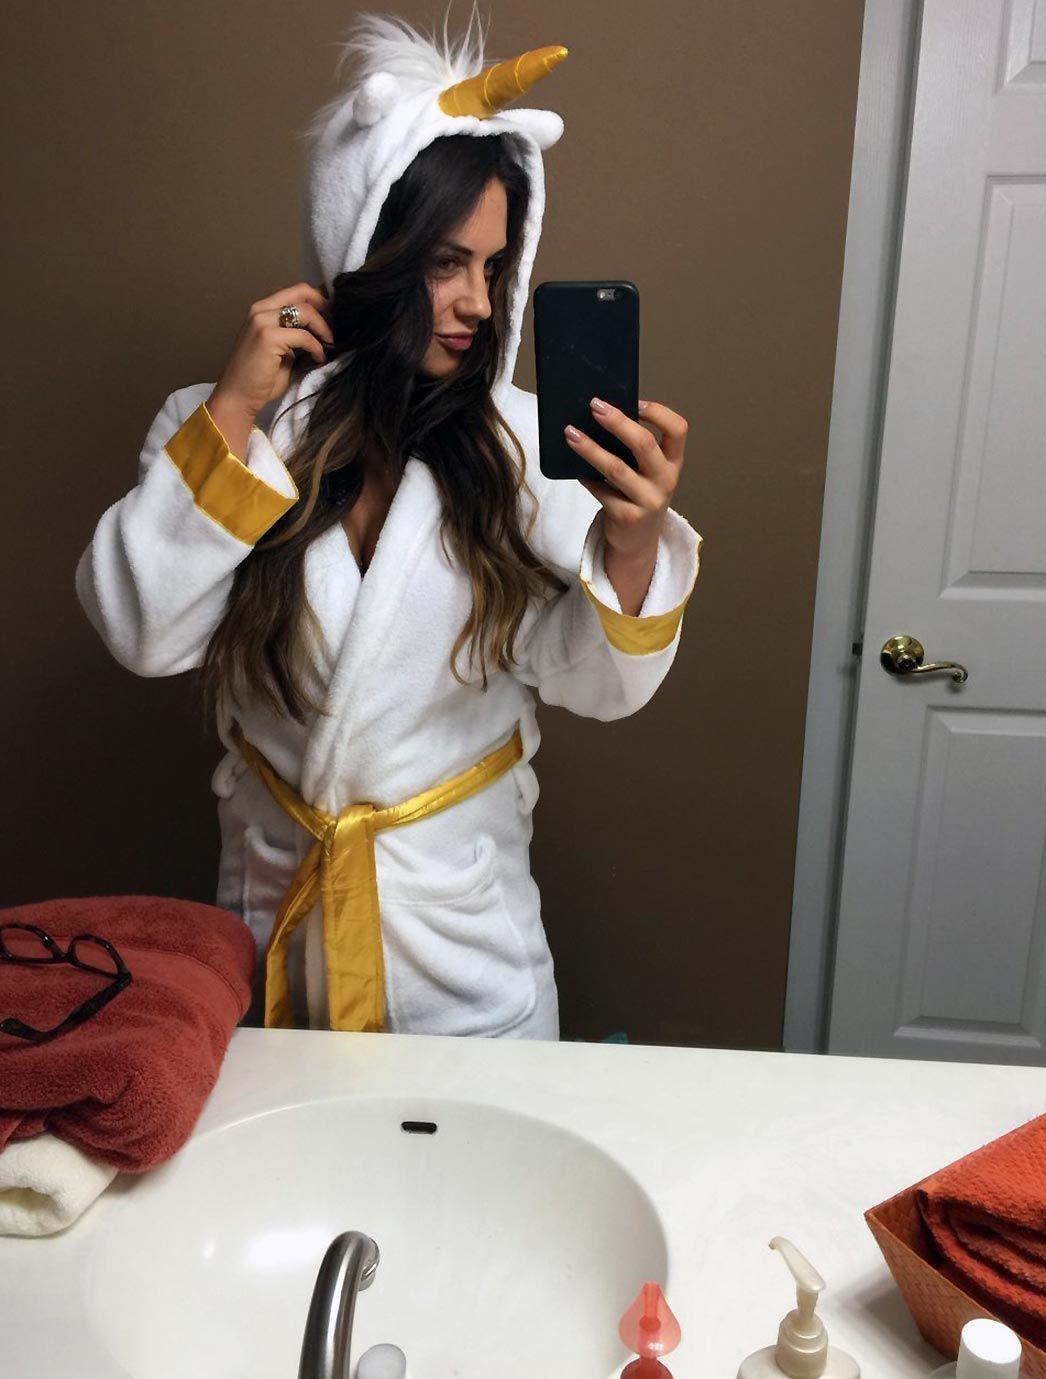 Celeste Bonin Nude Leaked The Fappening & Sexy 0222